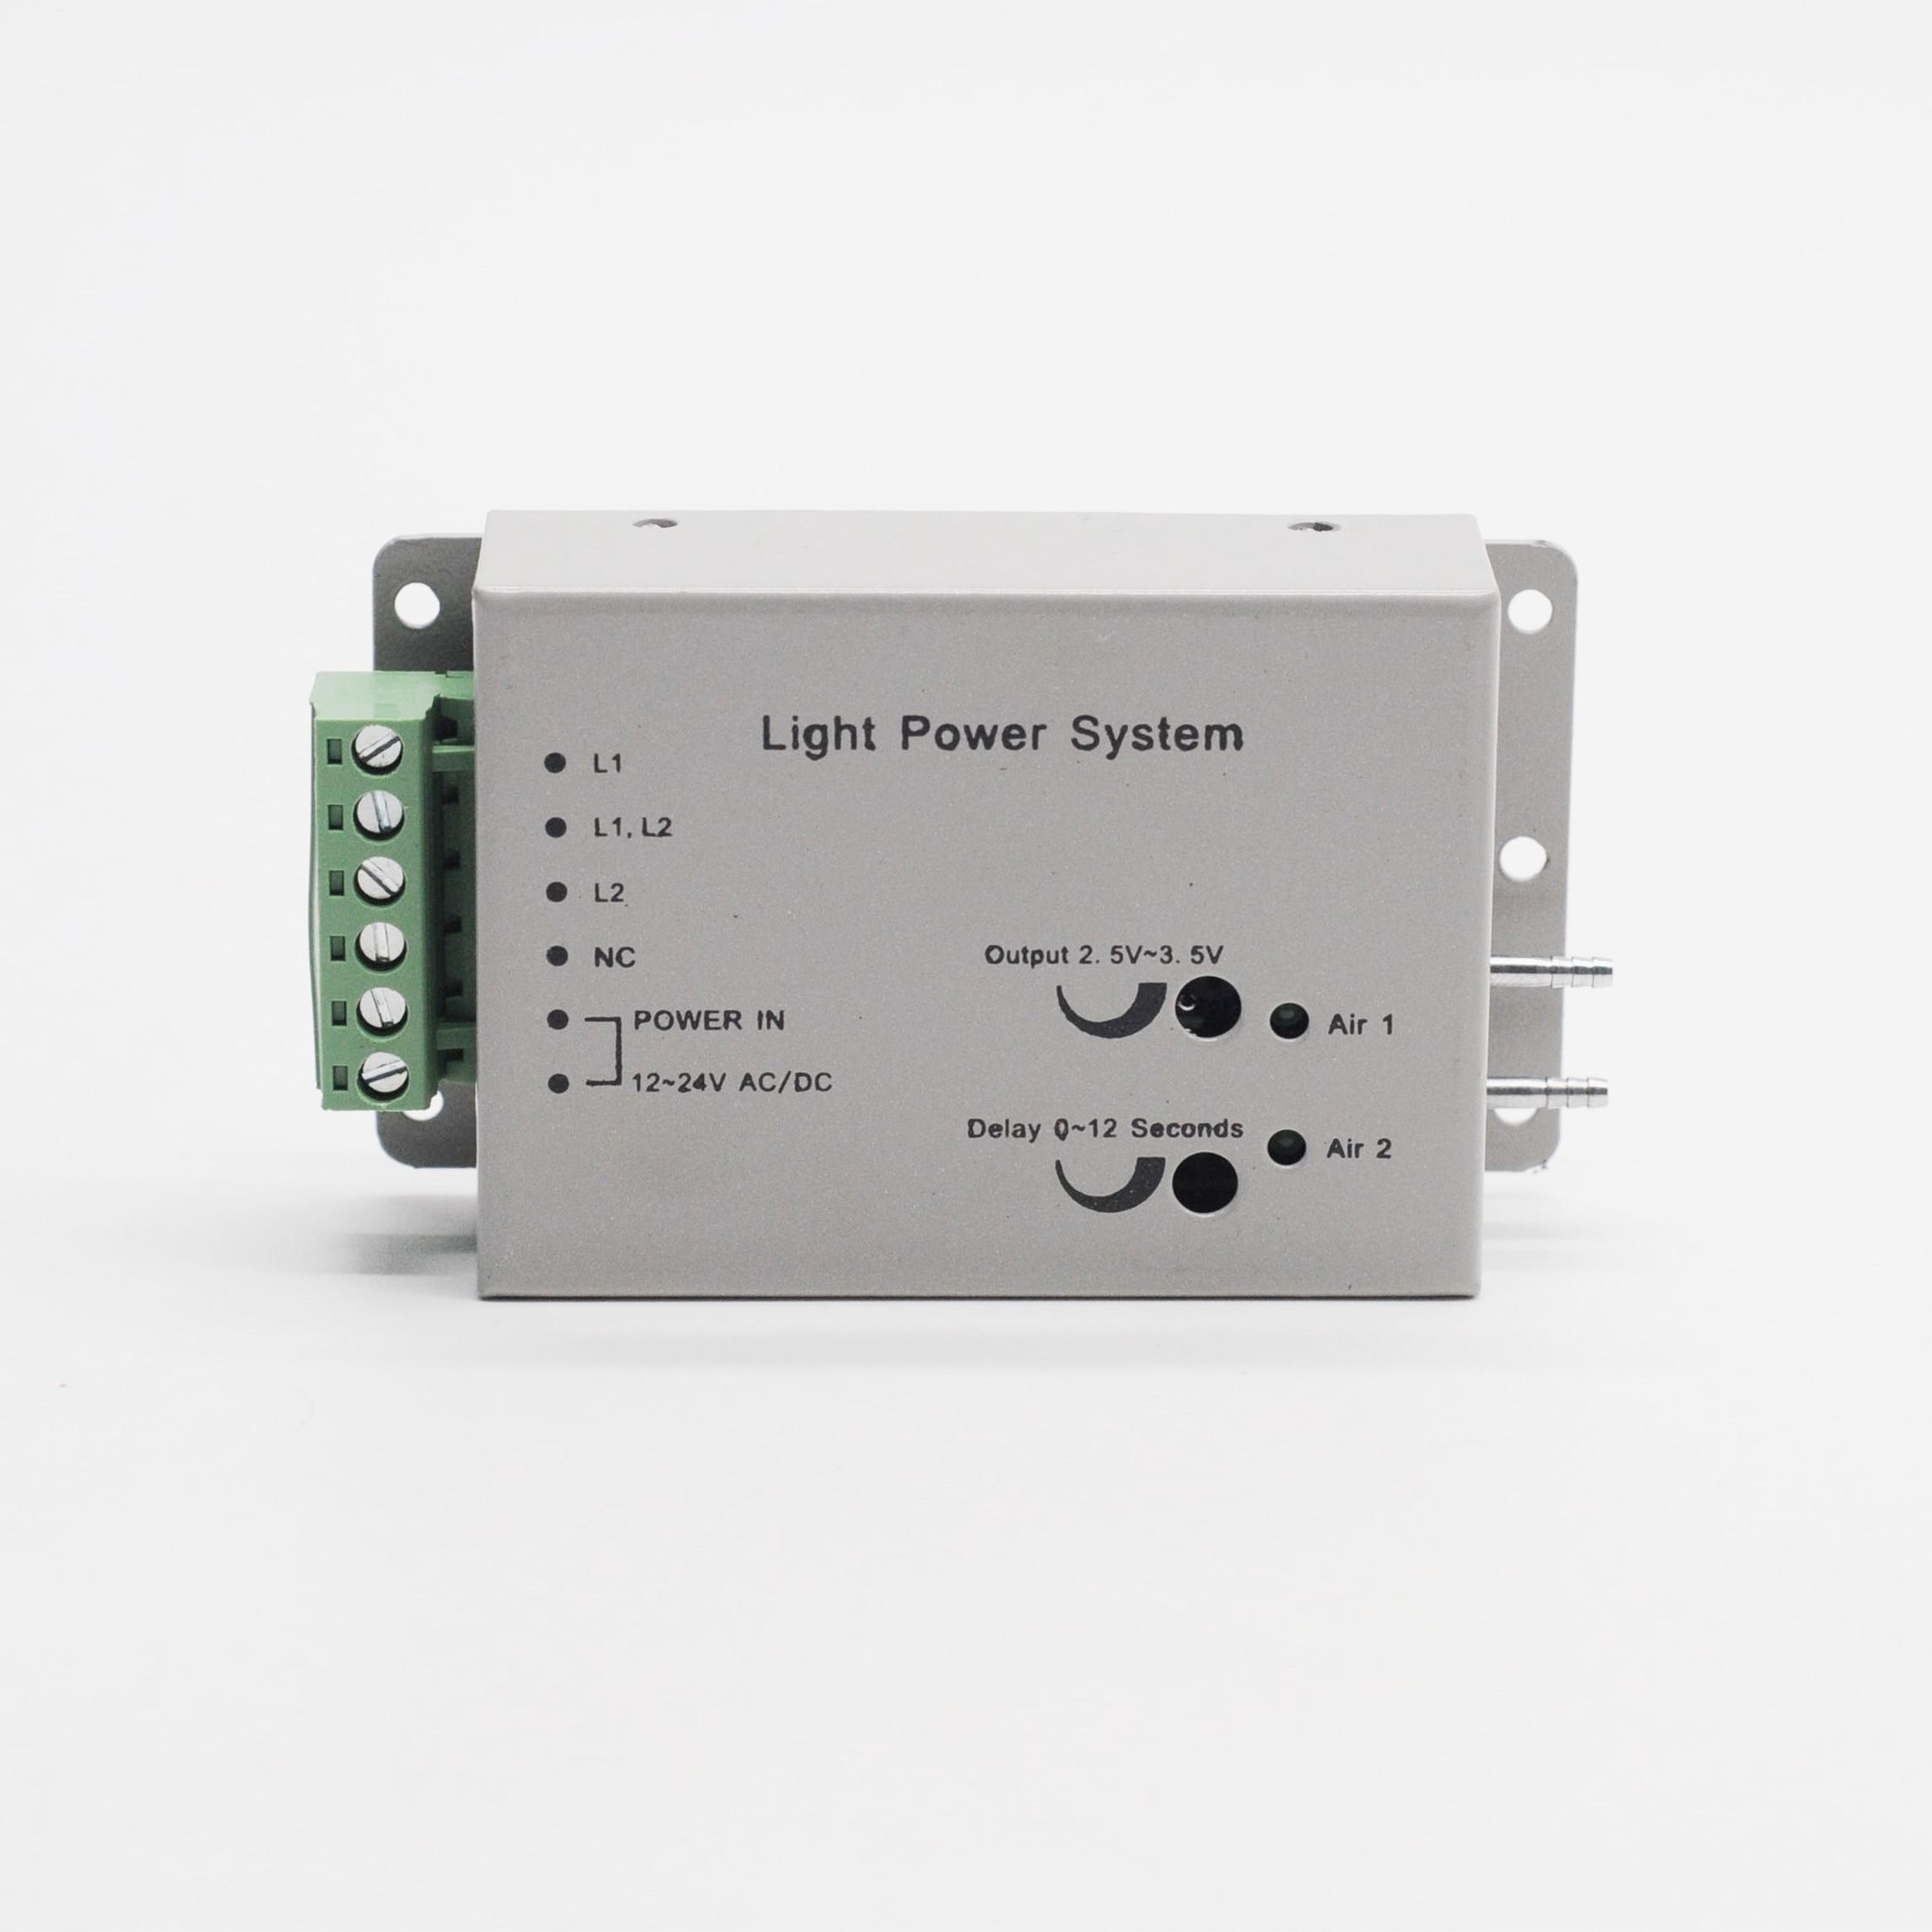 6Holes Dental LED Fiber Optic Handpiece Air Turbine Dental Fiber Optic Handpiece Light Power Control System Unit